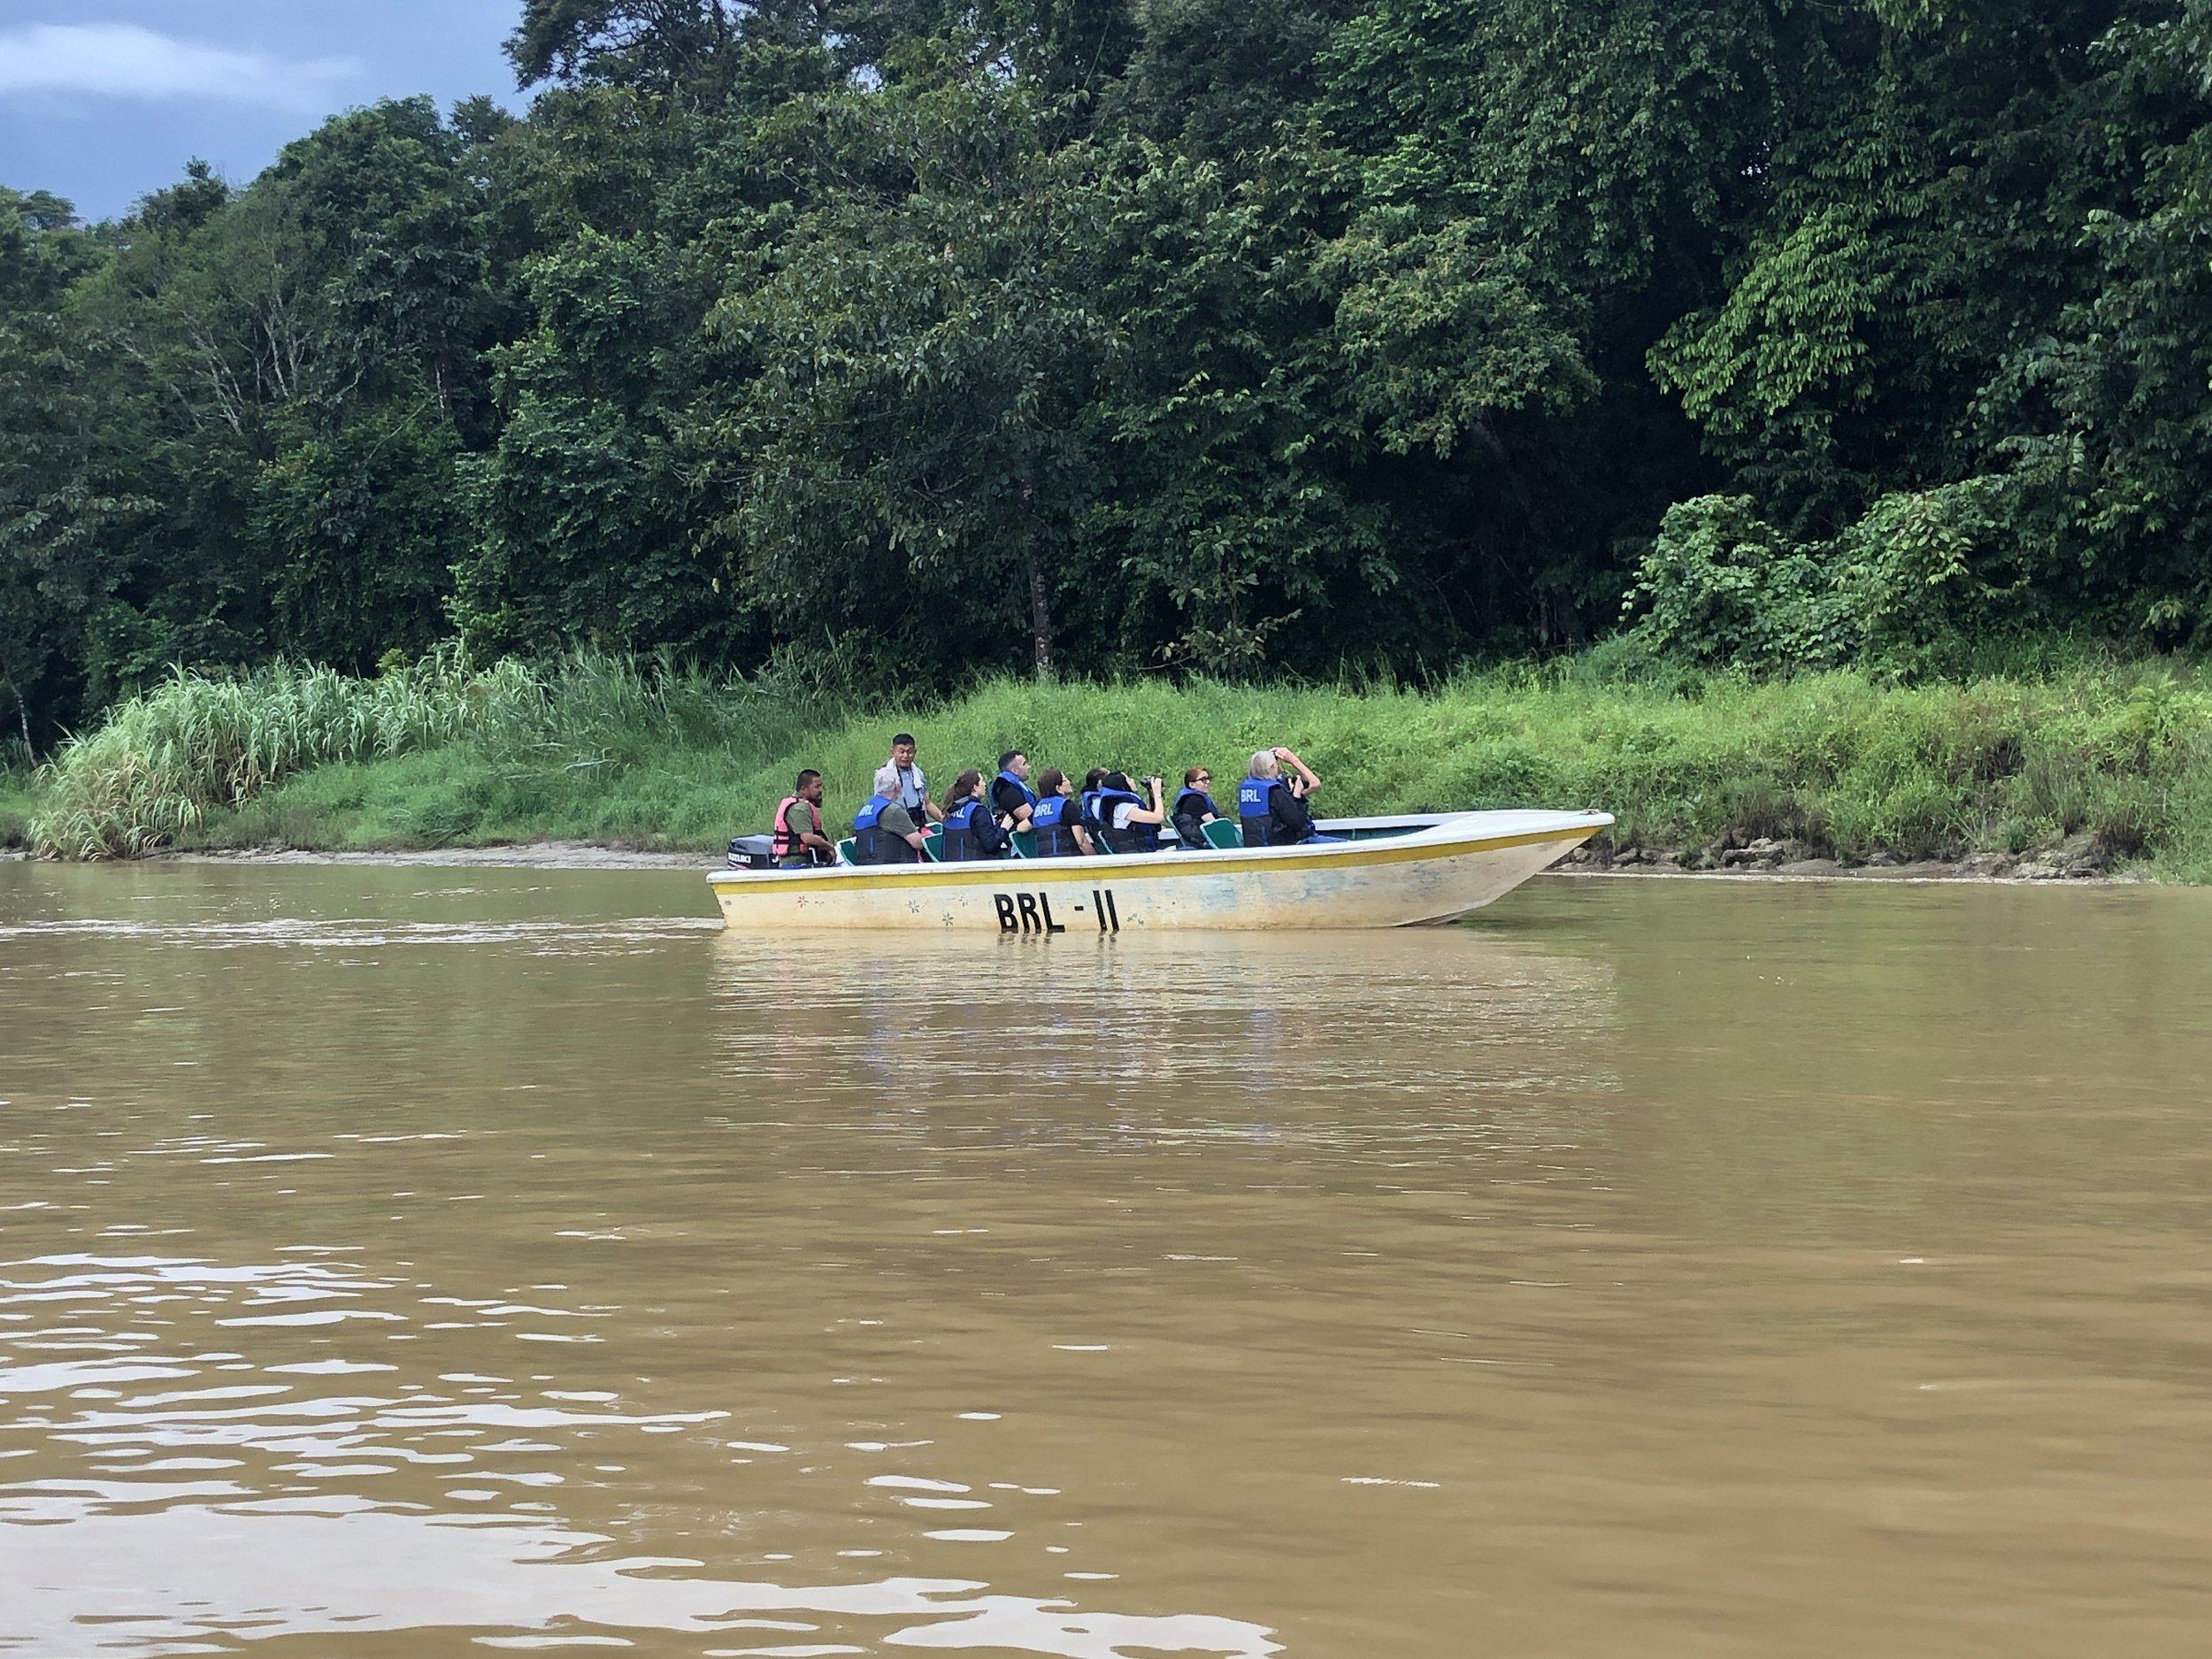 Searching for wildlife on the River KInabatangan